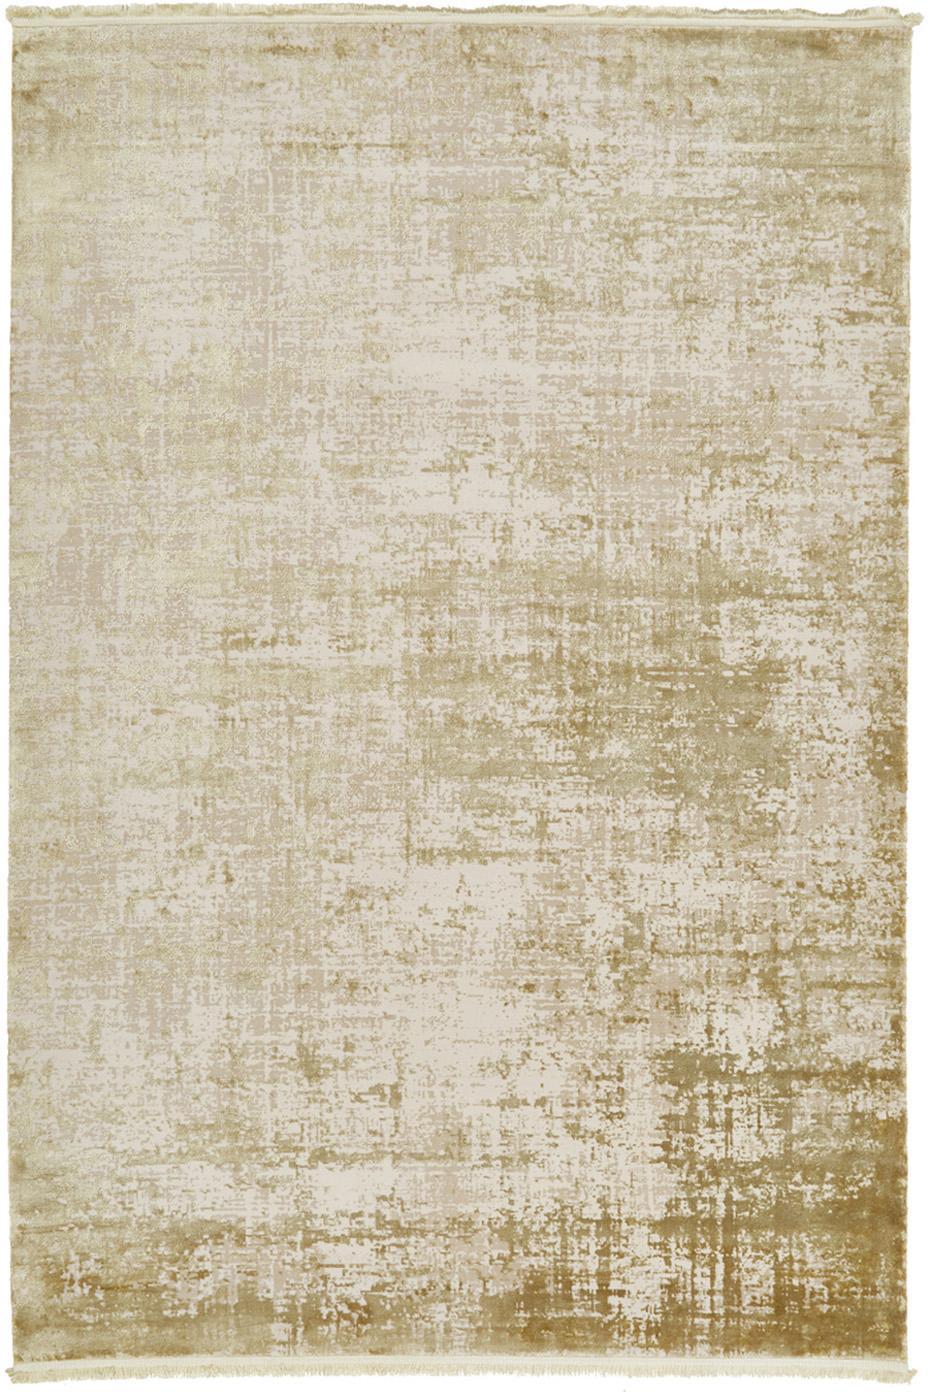 Schimmernder Teppich Cordoba mit Fransen, Vintage Style, Flor: 70% Acryl, 30% Viskose, Olivgrün, Beige, B 200 x L 290 cm (Größe L)